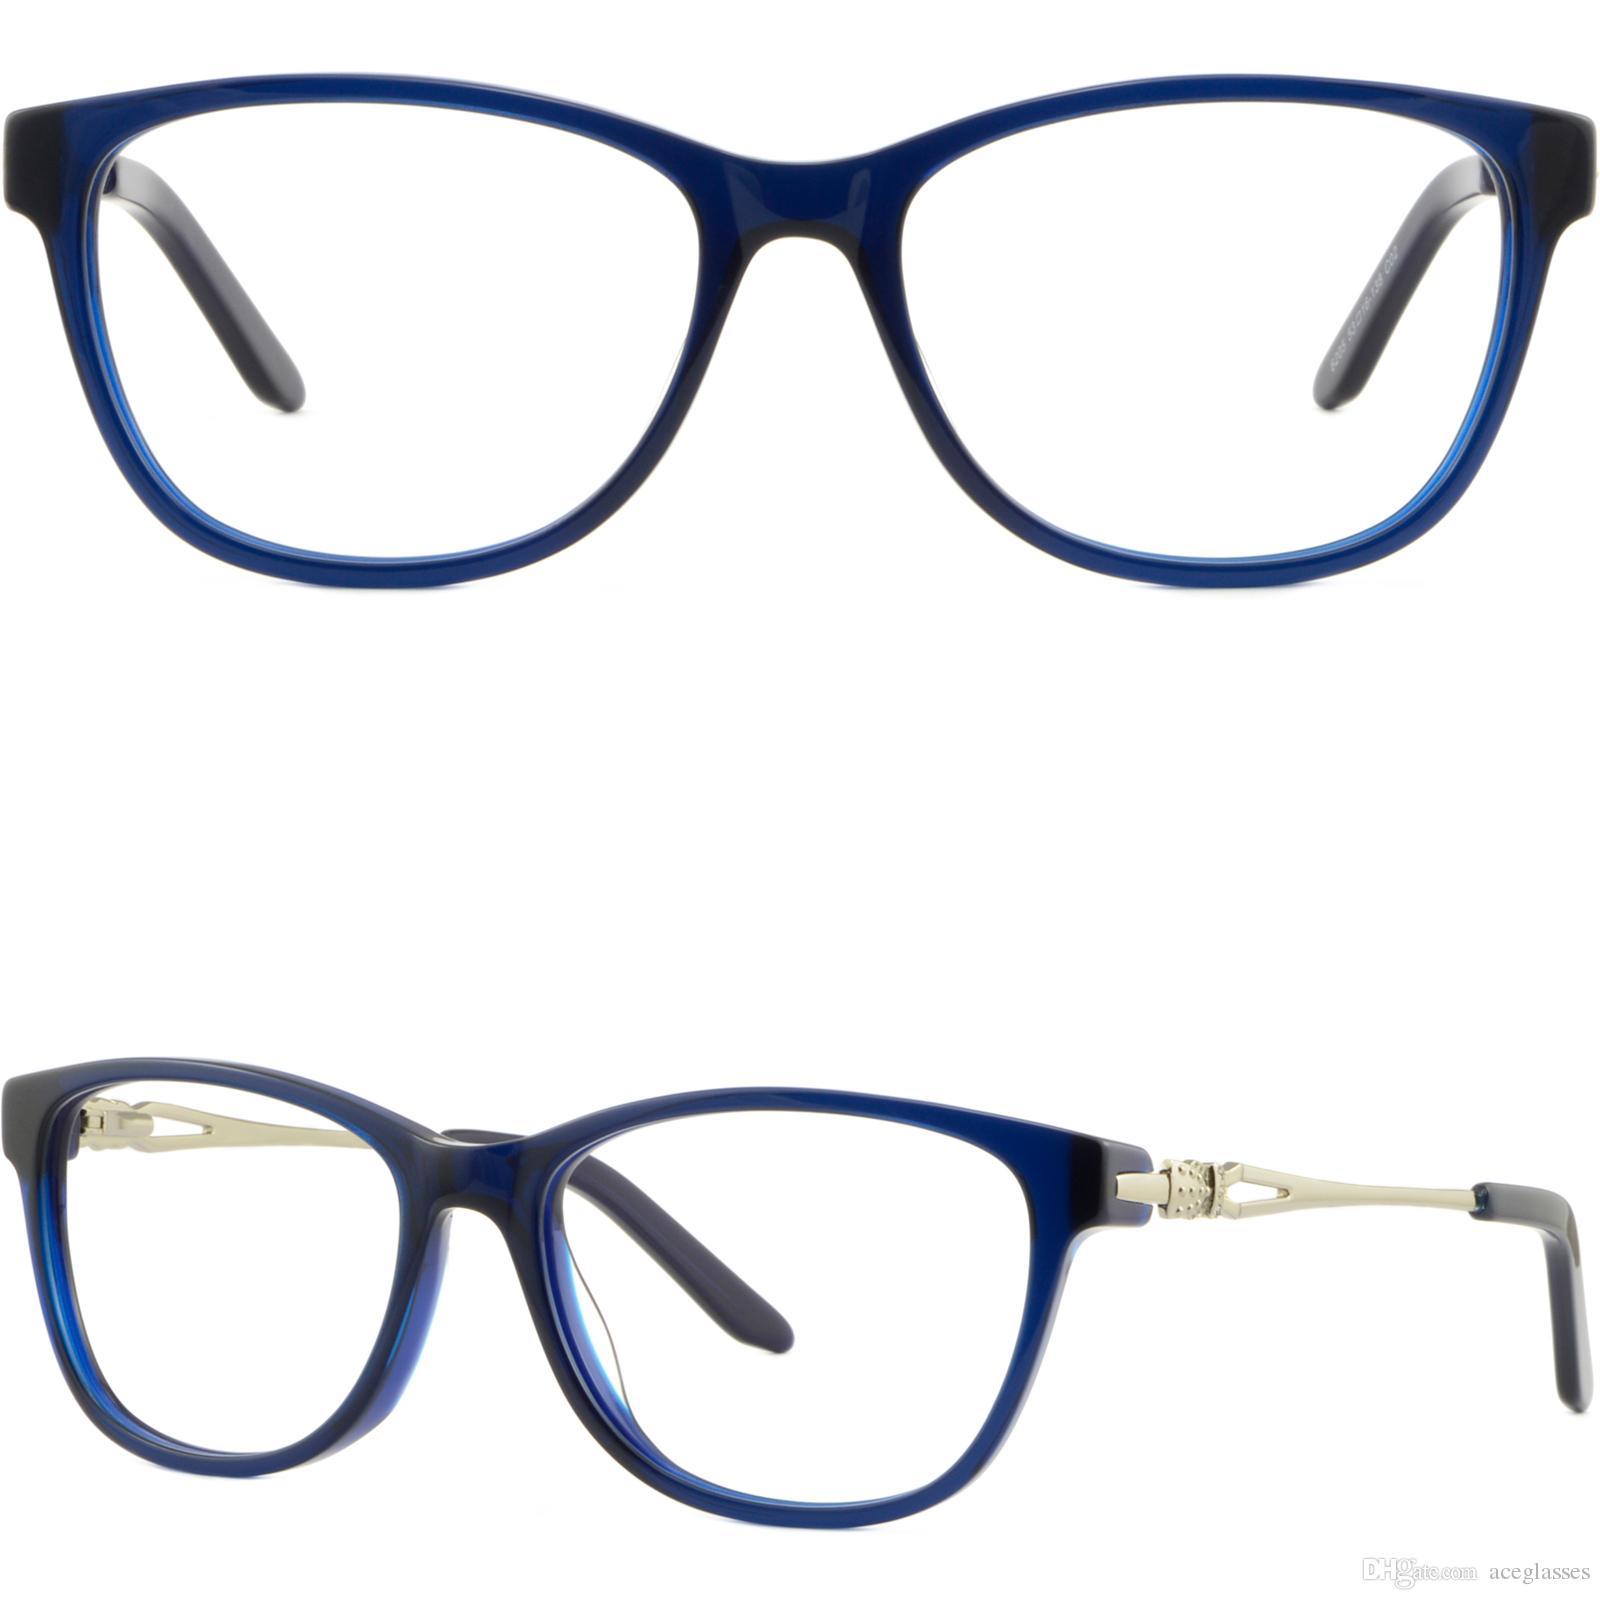 cb0c1cd8d56 Womens Acetate Frames Spring Hinges Metal Arms RX Prescription Glasses Navy  Blue Theo Eyeglass Frames Top Eyeglass Frames From Aceglasses